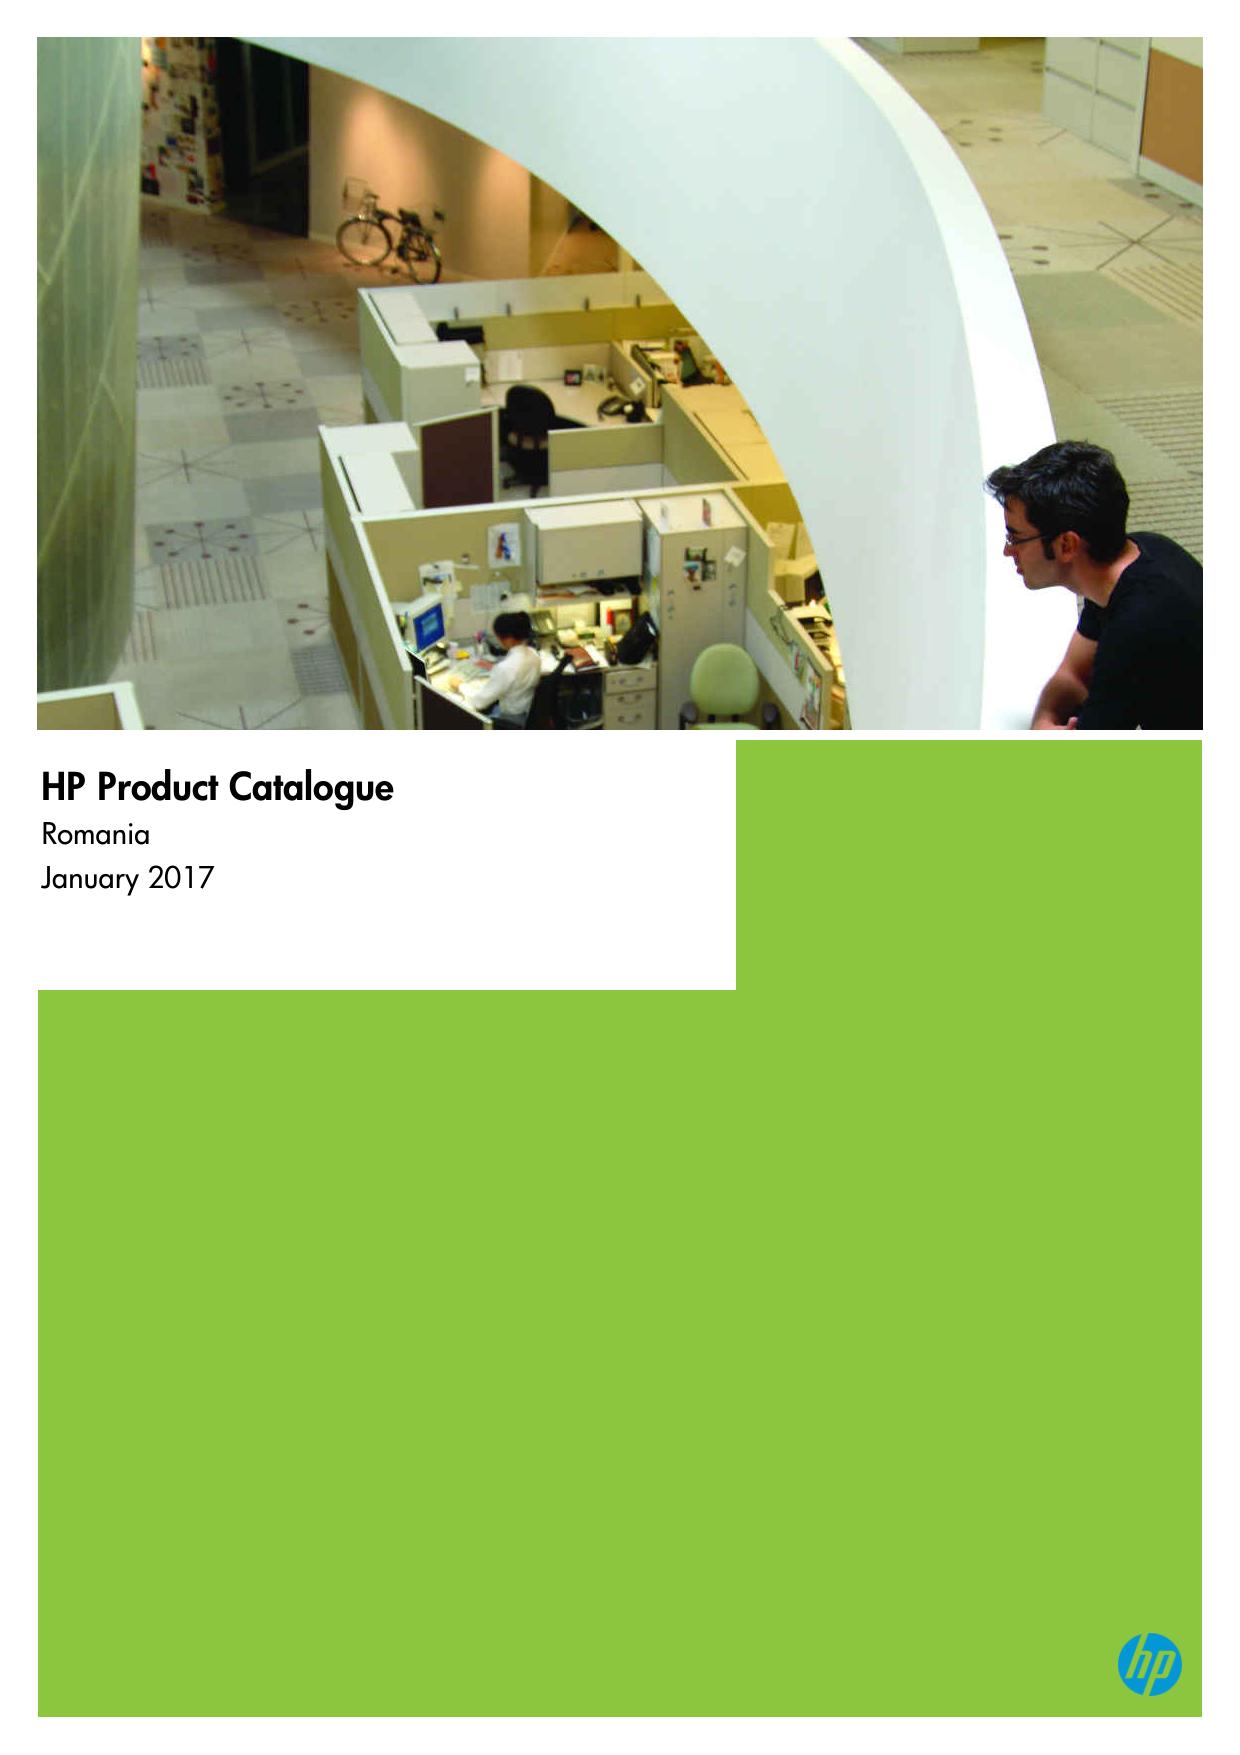 HP Product Catalogue | manualzz com